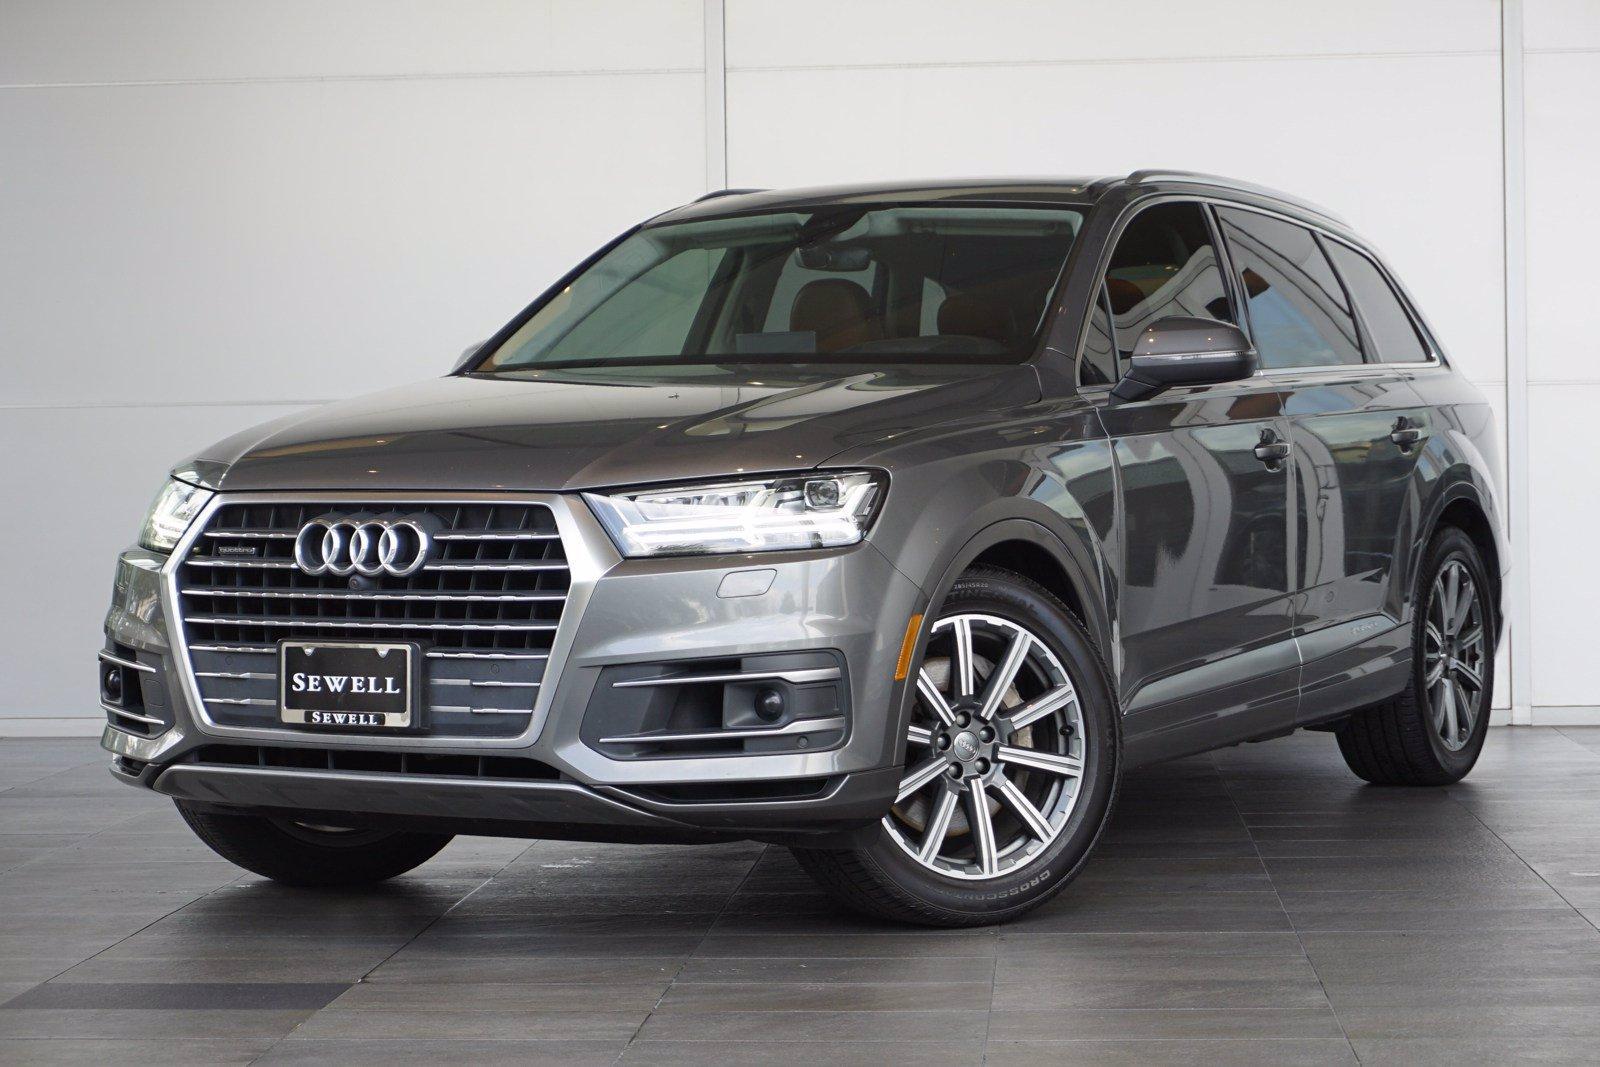 2018 Audi Q7 Vehicle Photo in Houston, TX 77079